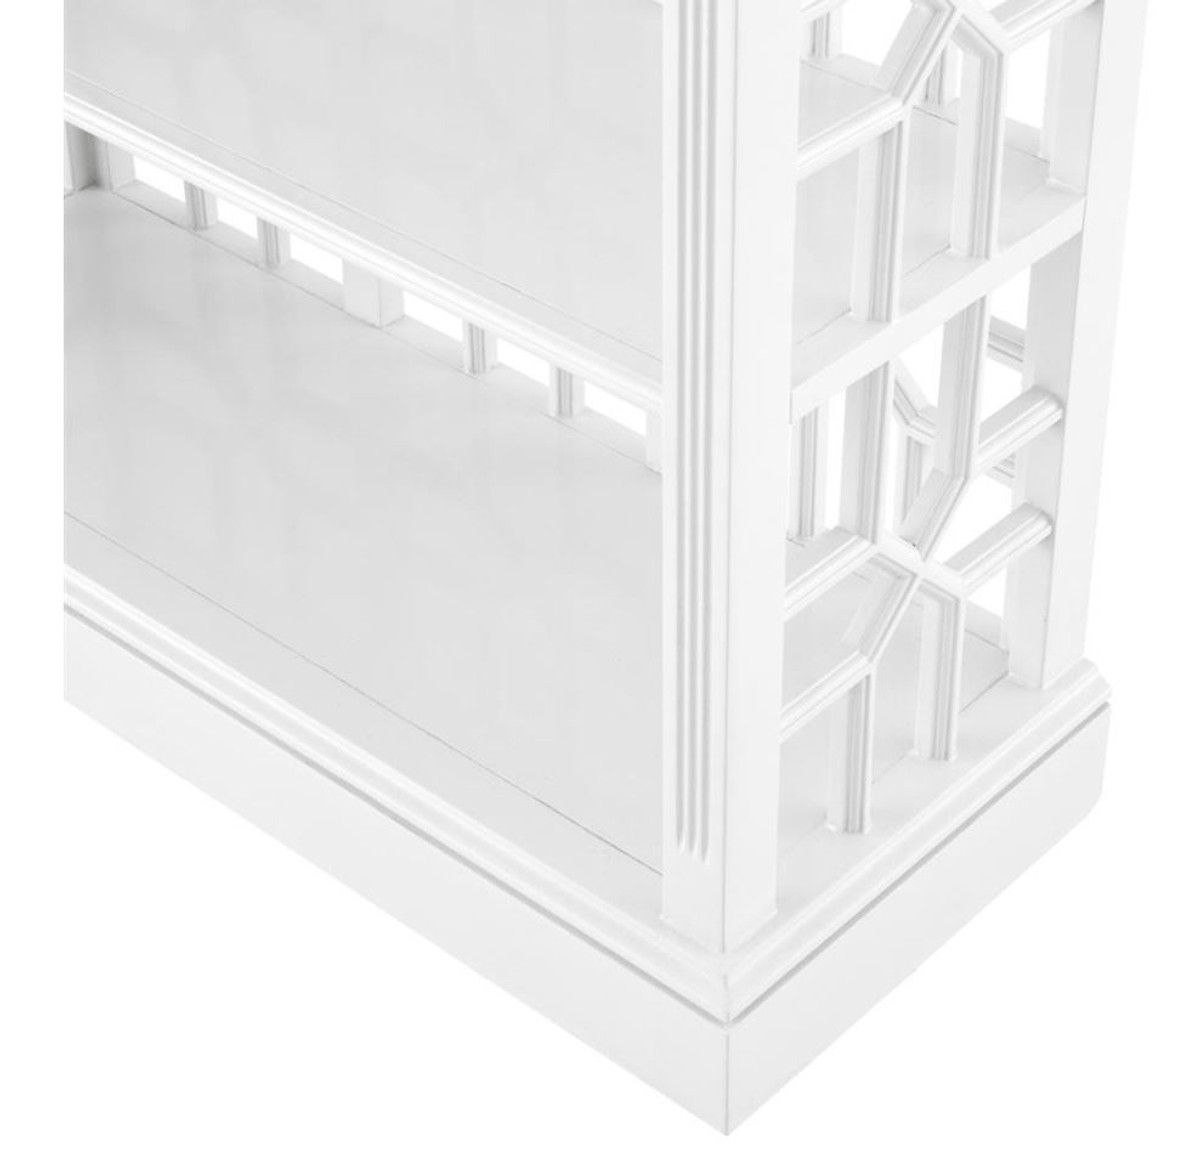 Casa Padrino Designer Mahagoni Regalschrank Piano Weiß - Luxus Qualität 4